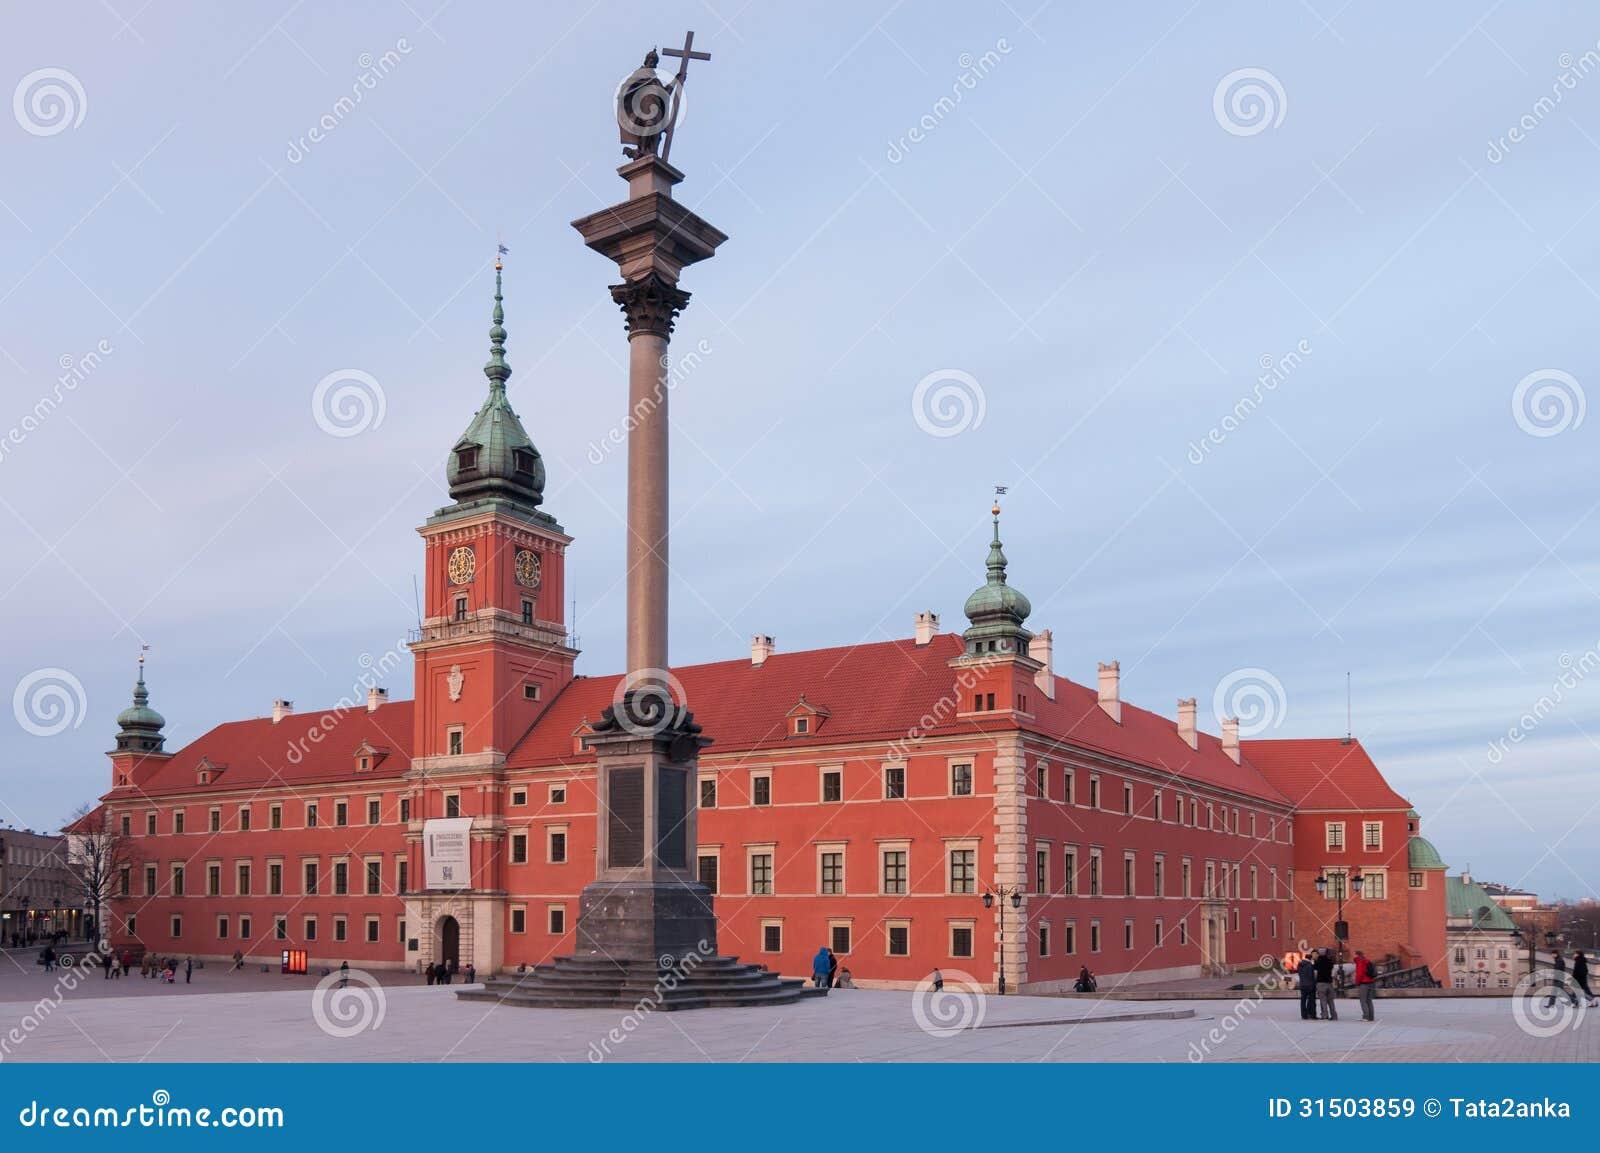 Royal Castle in Warsaw and Sigismund s Column, Poland